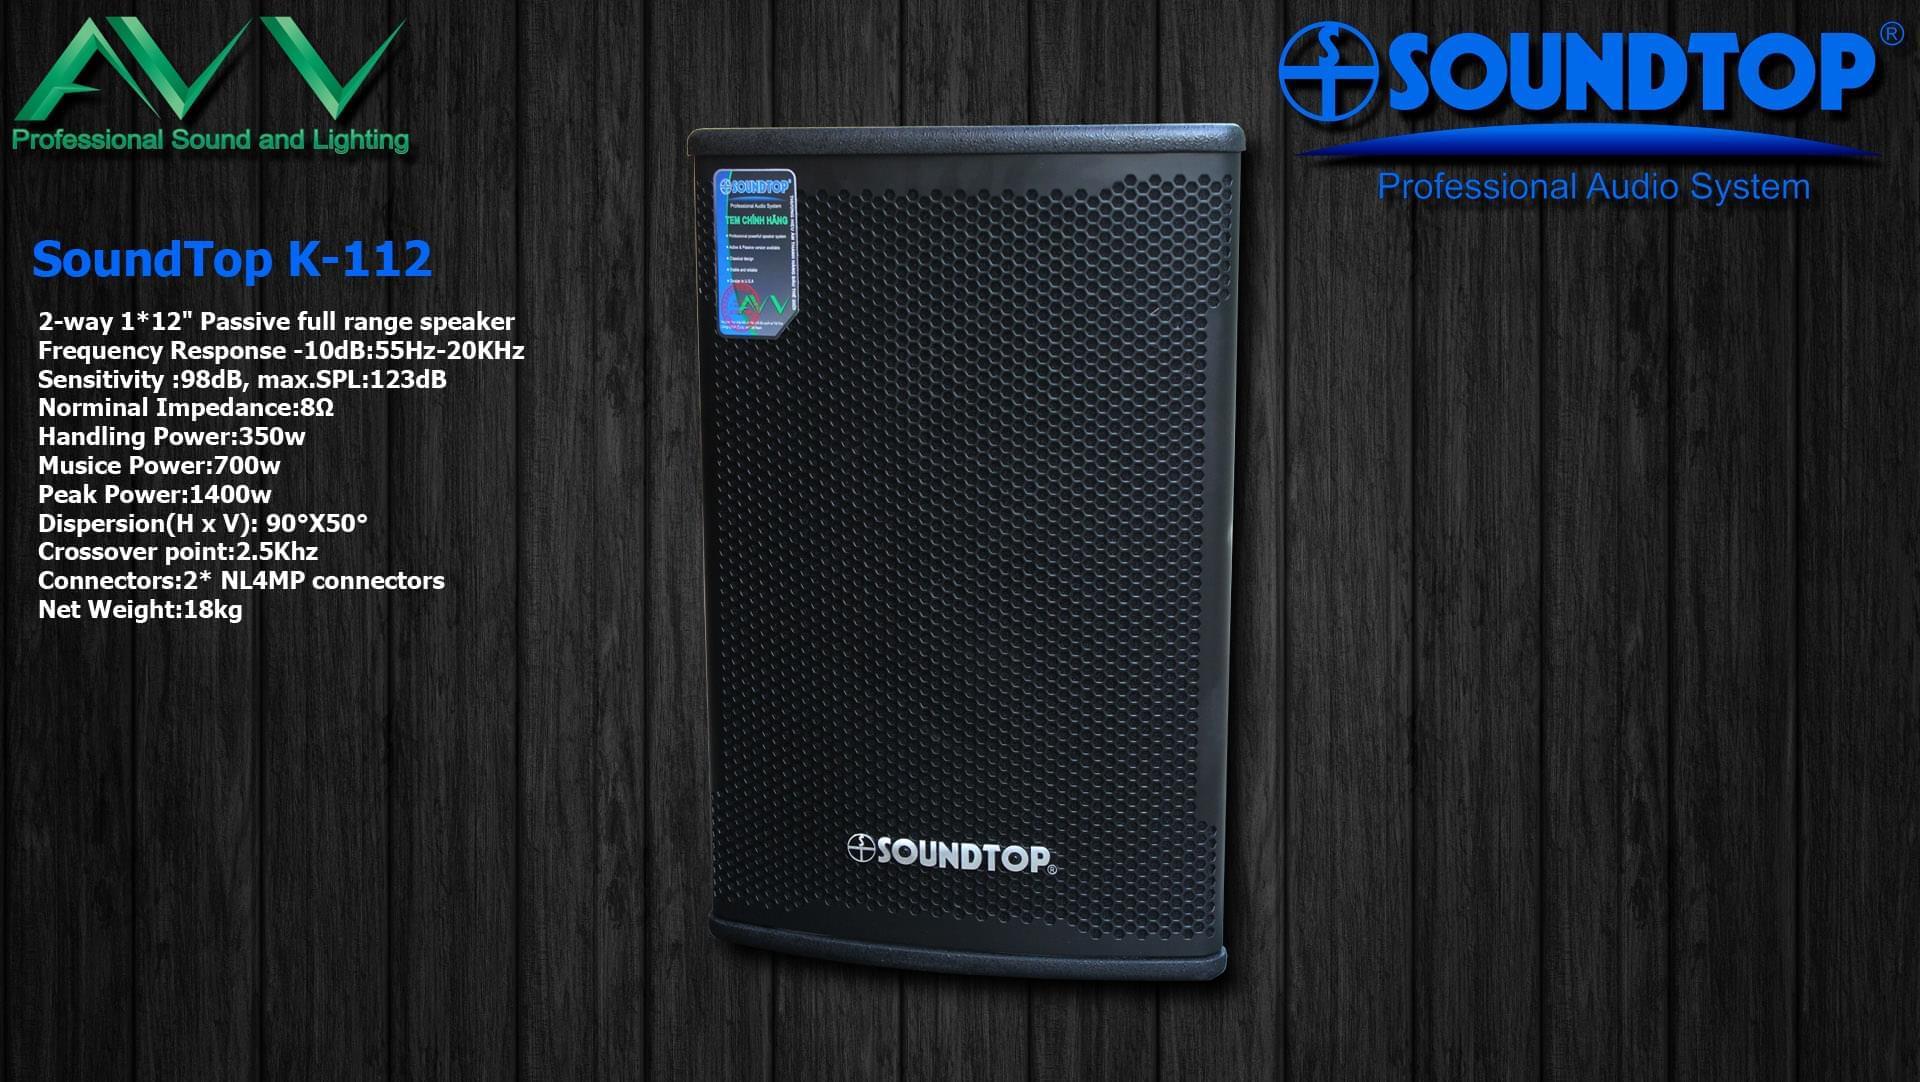 soundtop-k112-chi-tiet-02.jpg